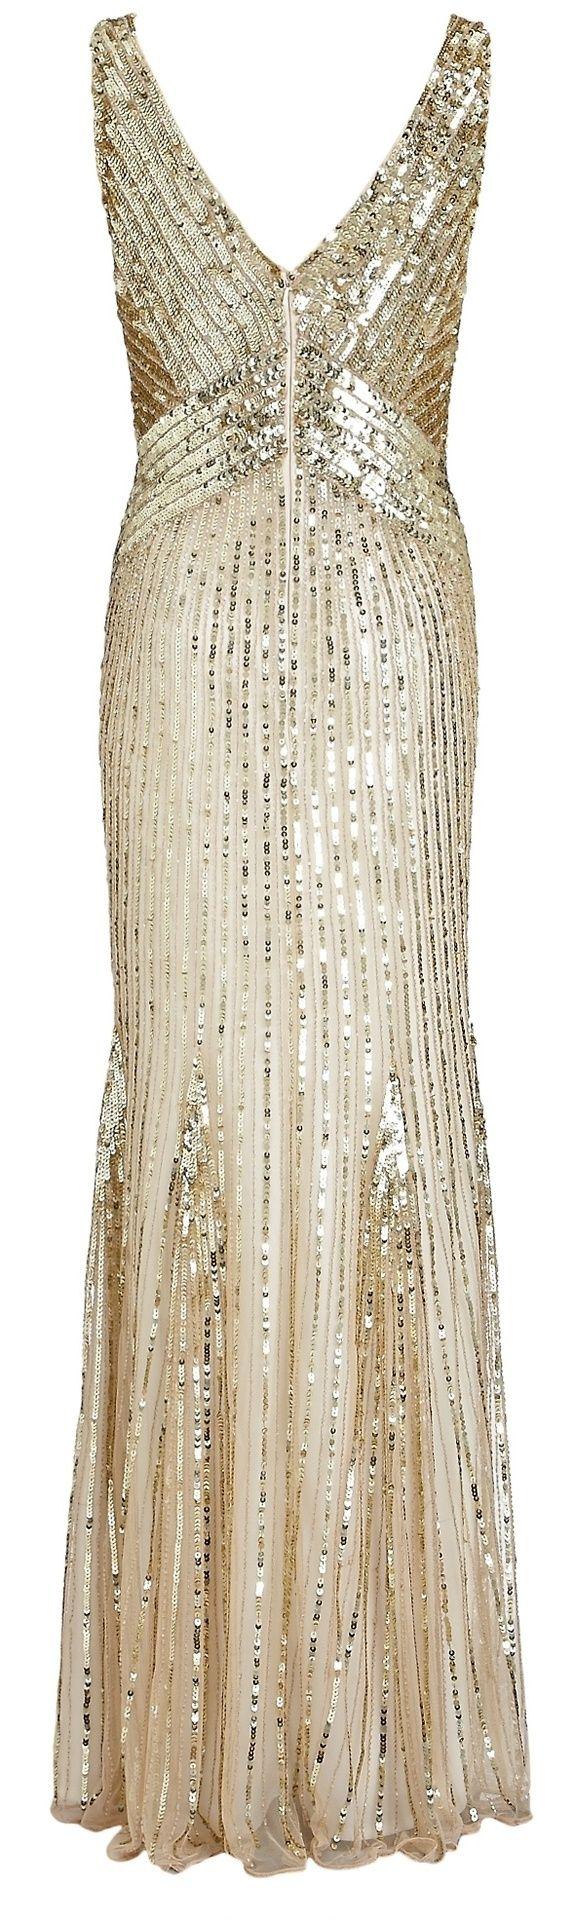 Gold gold bridesmaid dresses john lewis for John lewis wedding dresses